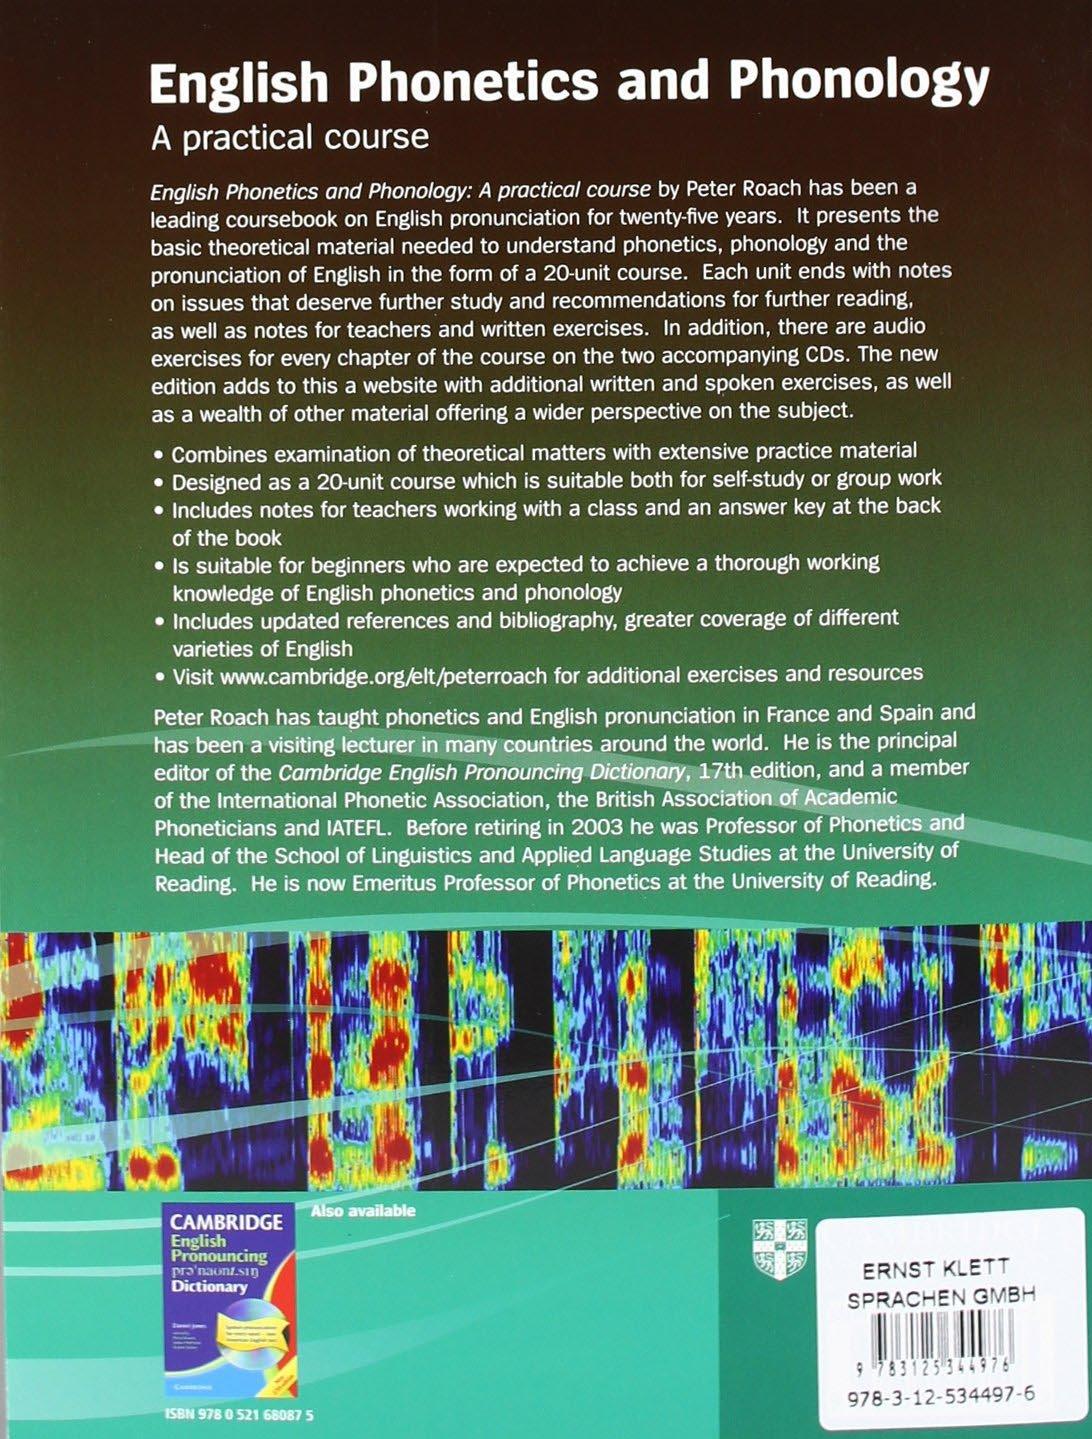 (PDF) ENGLISH PHONETICS - TEXTBOOK | Olya Tsoop - Academia.edu